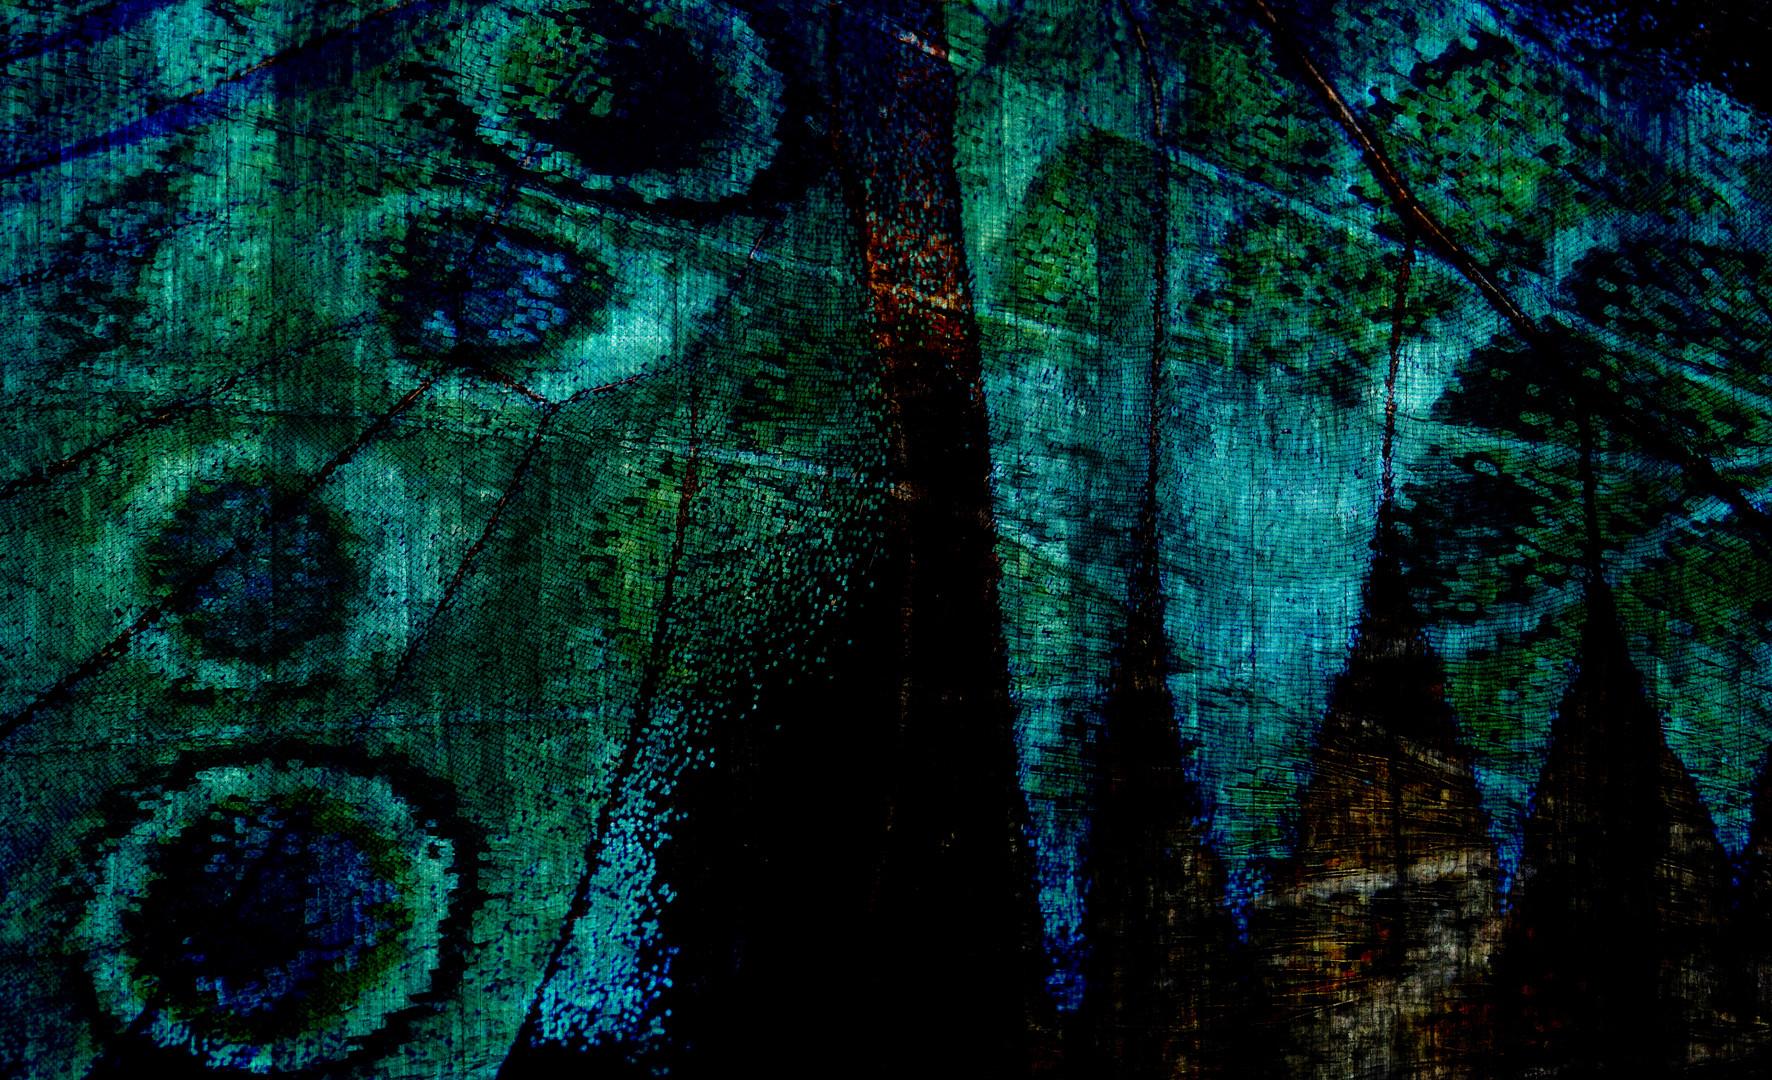 Suite Marguerite Yourcenar